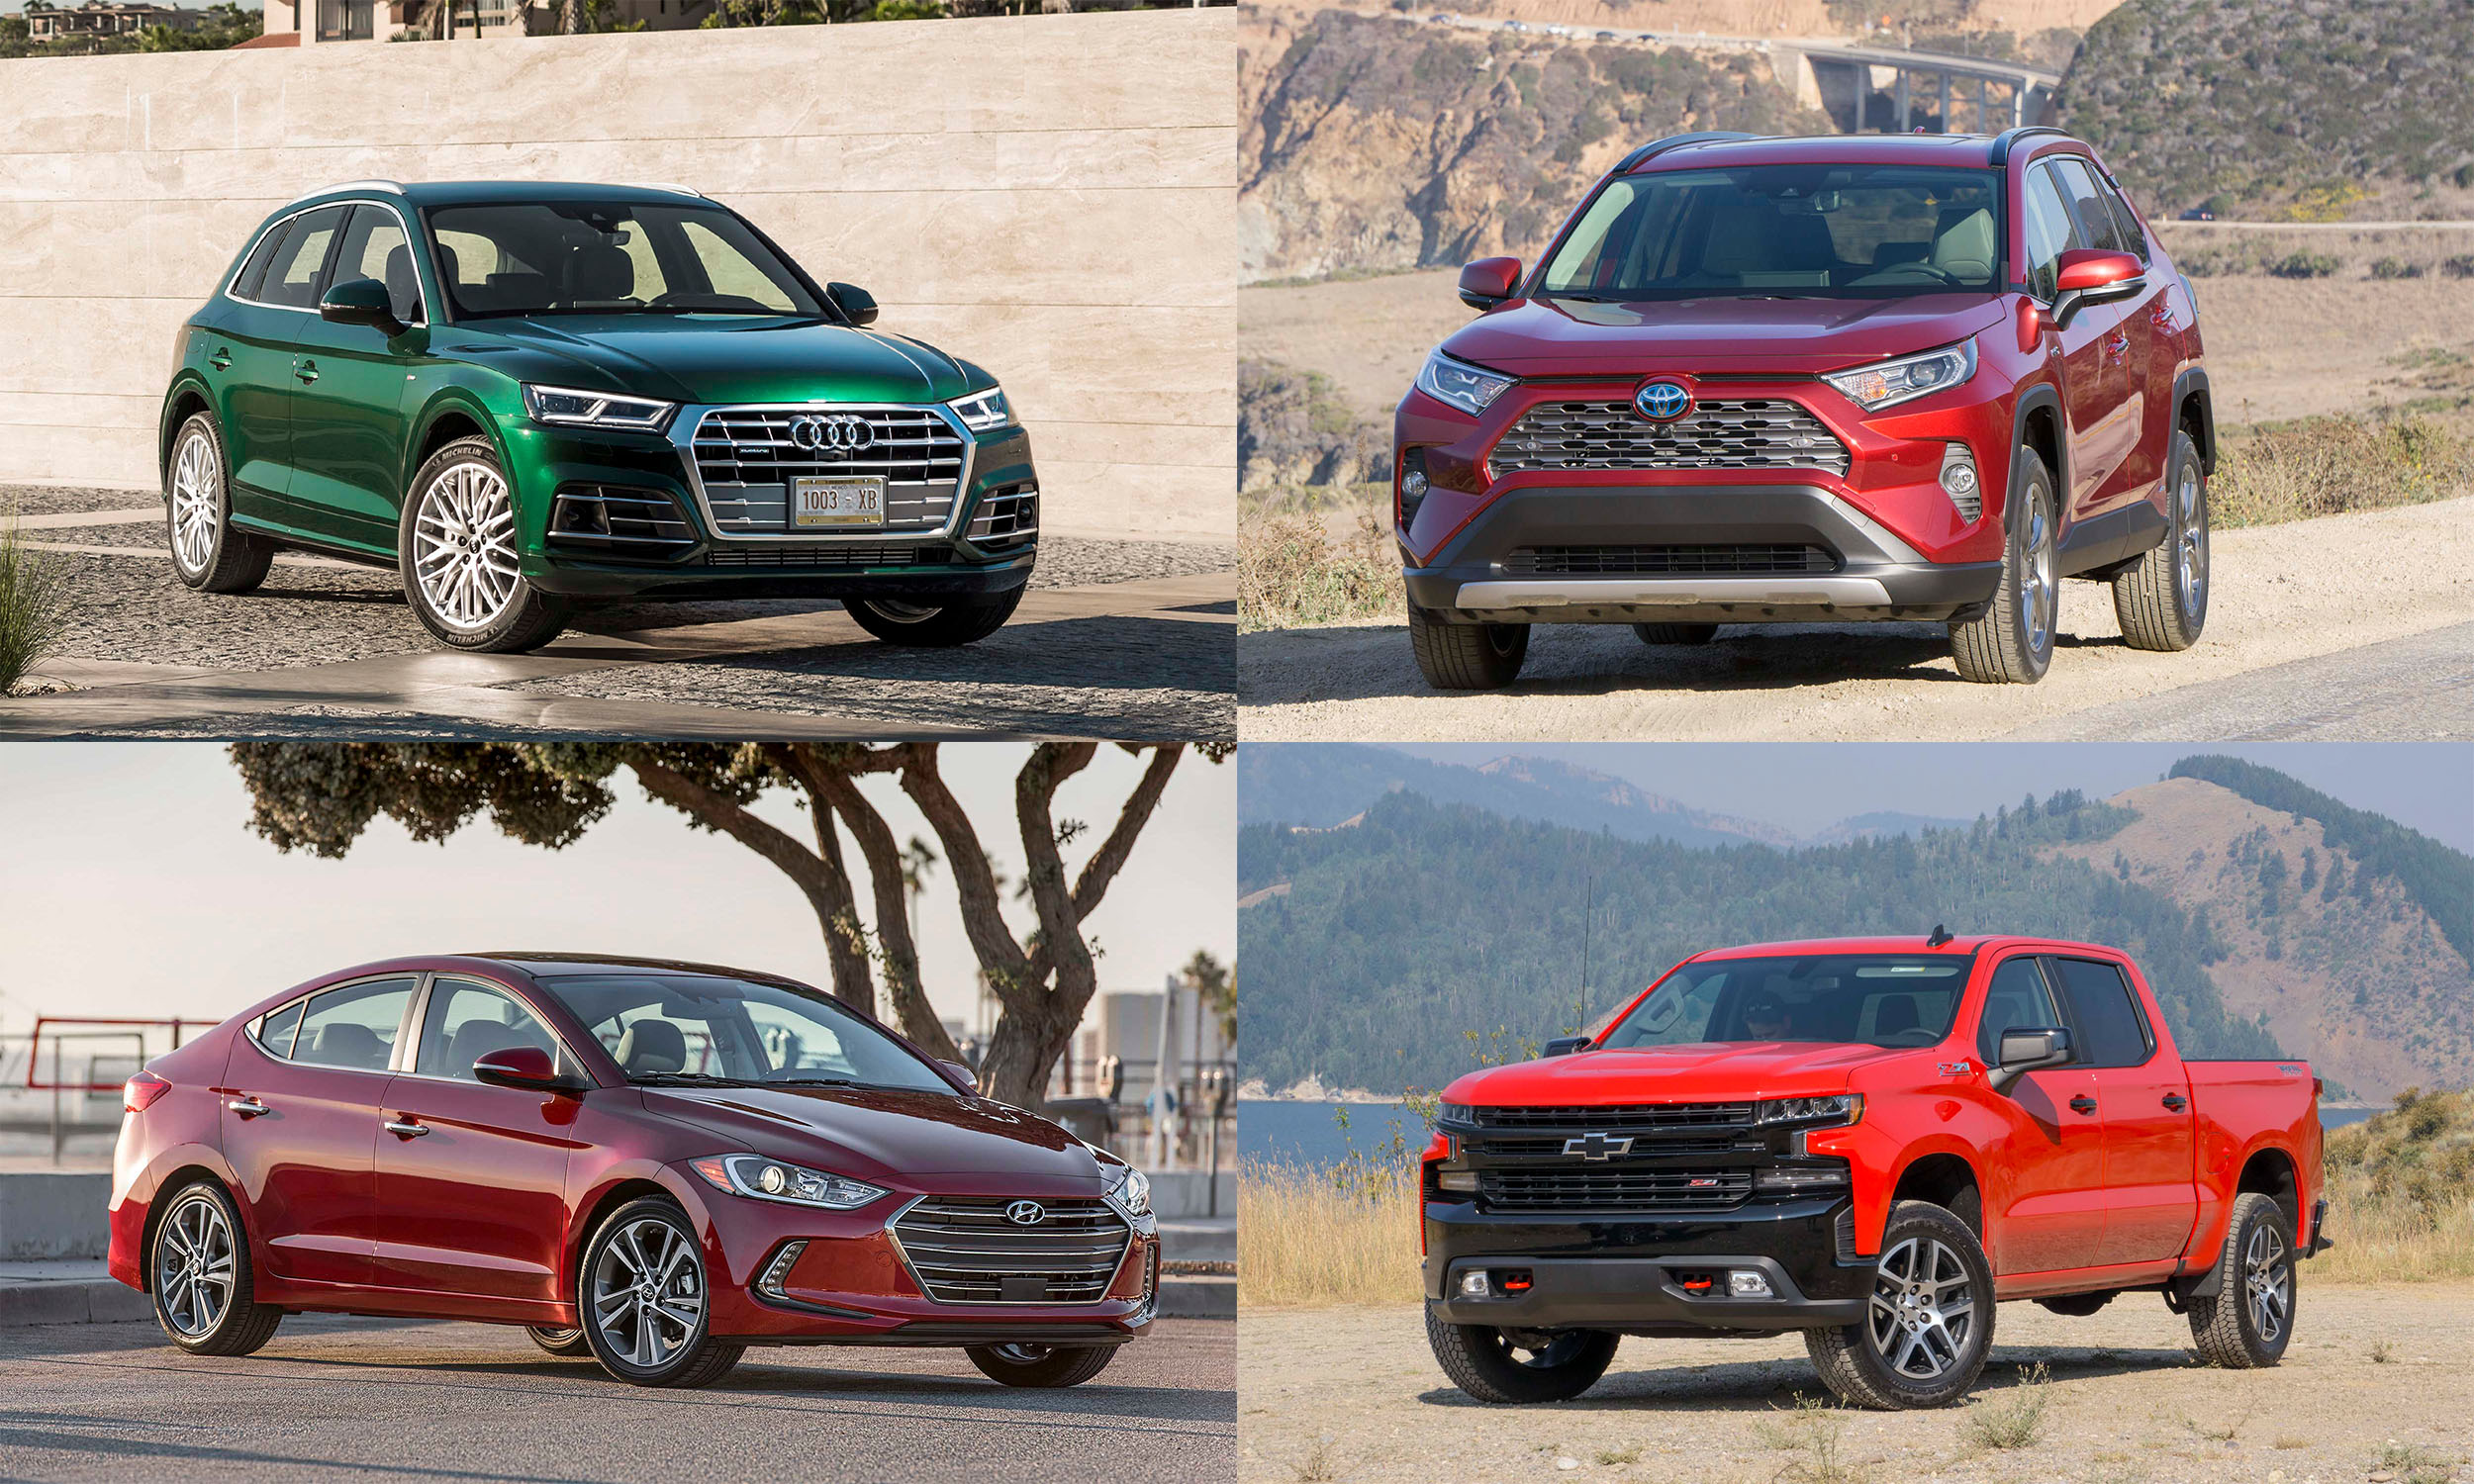 © Audi AG, © Hyundai Motor America, © Automotive Content Experience